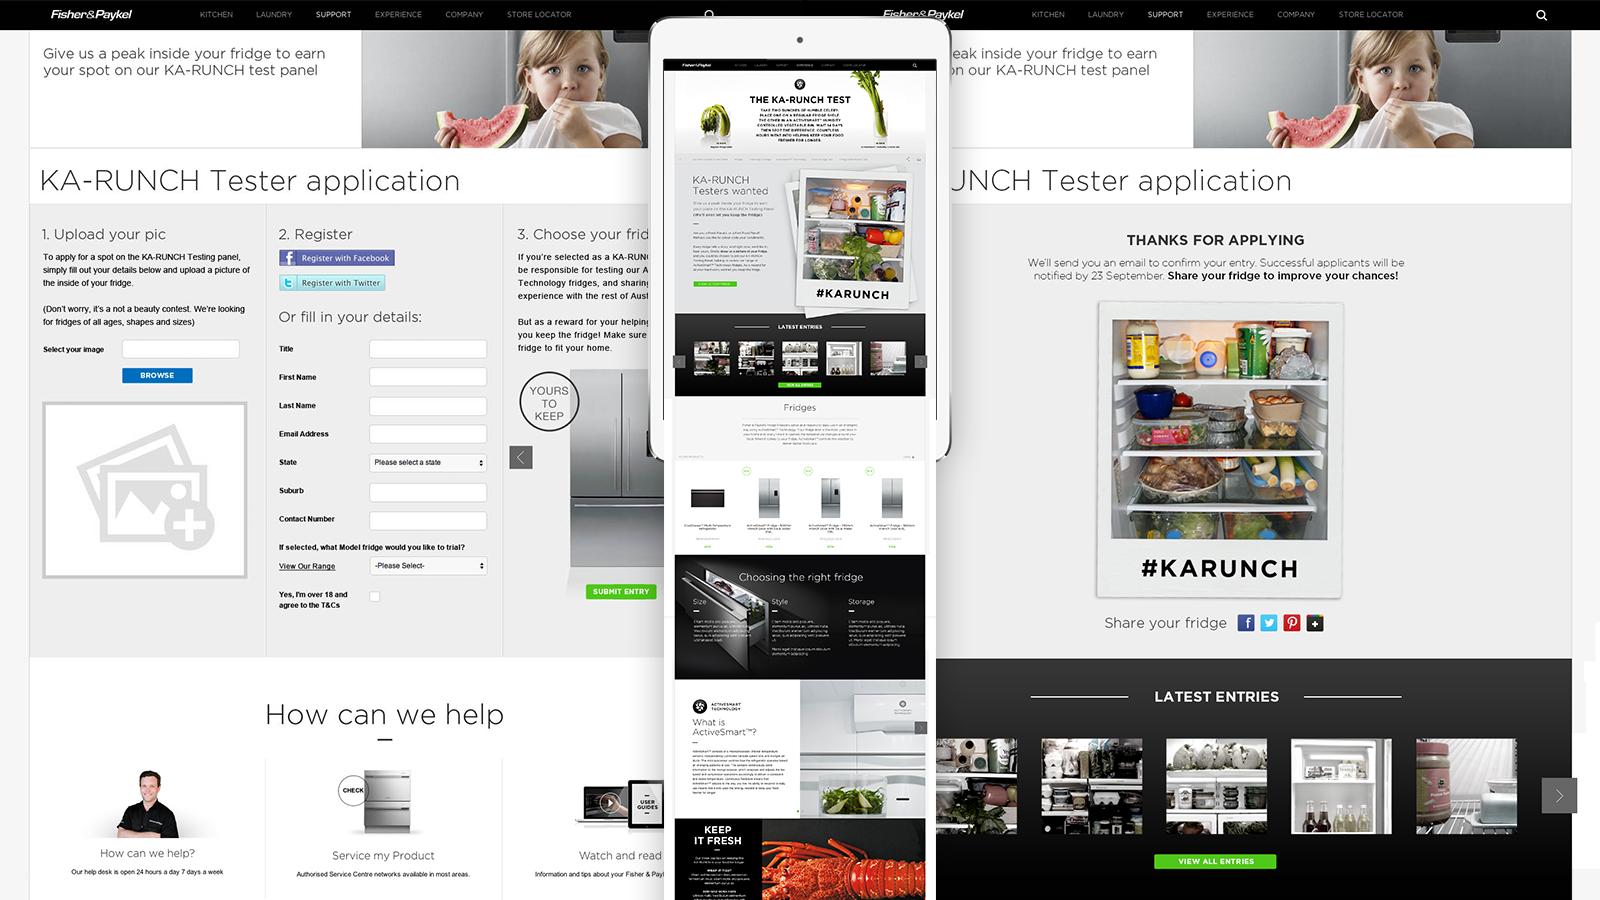 Fisher & Paykel | Ka-runch tester application form responsive design | Devotion